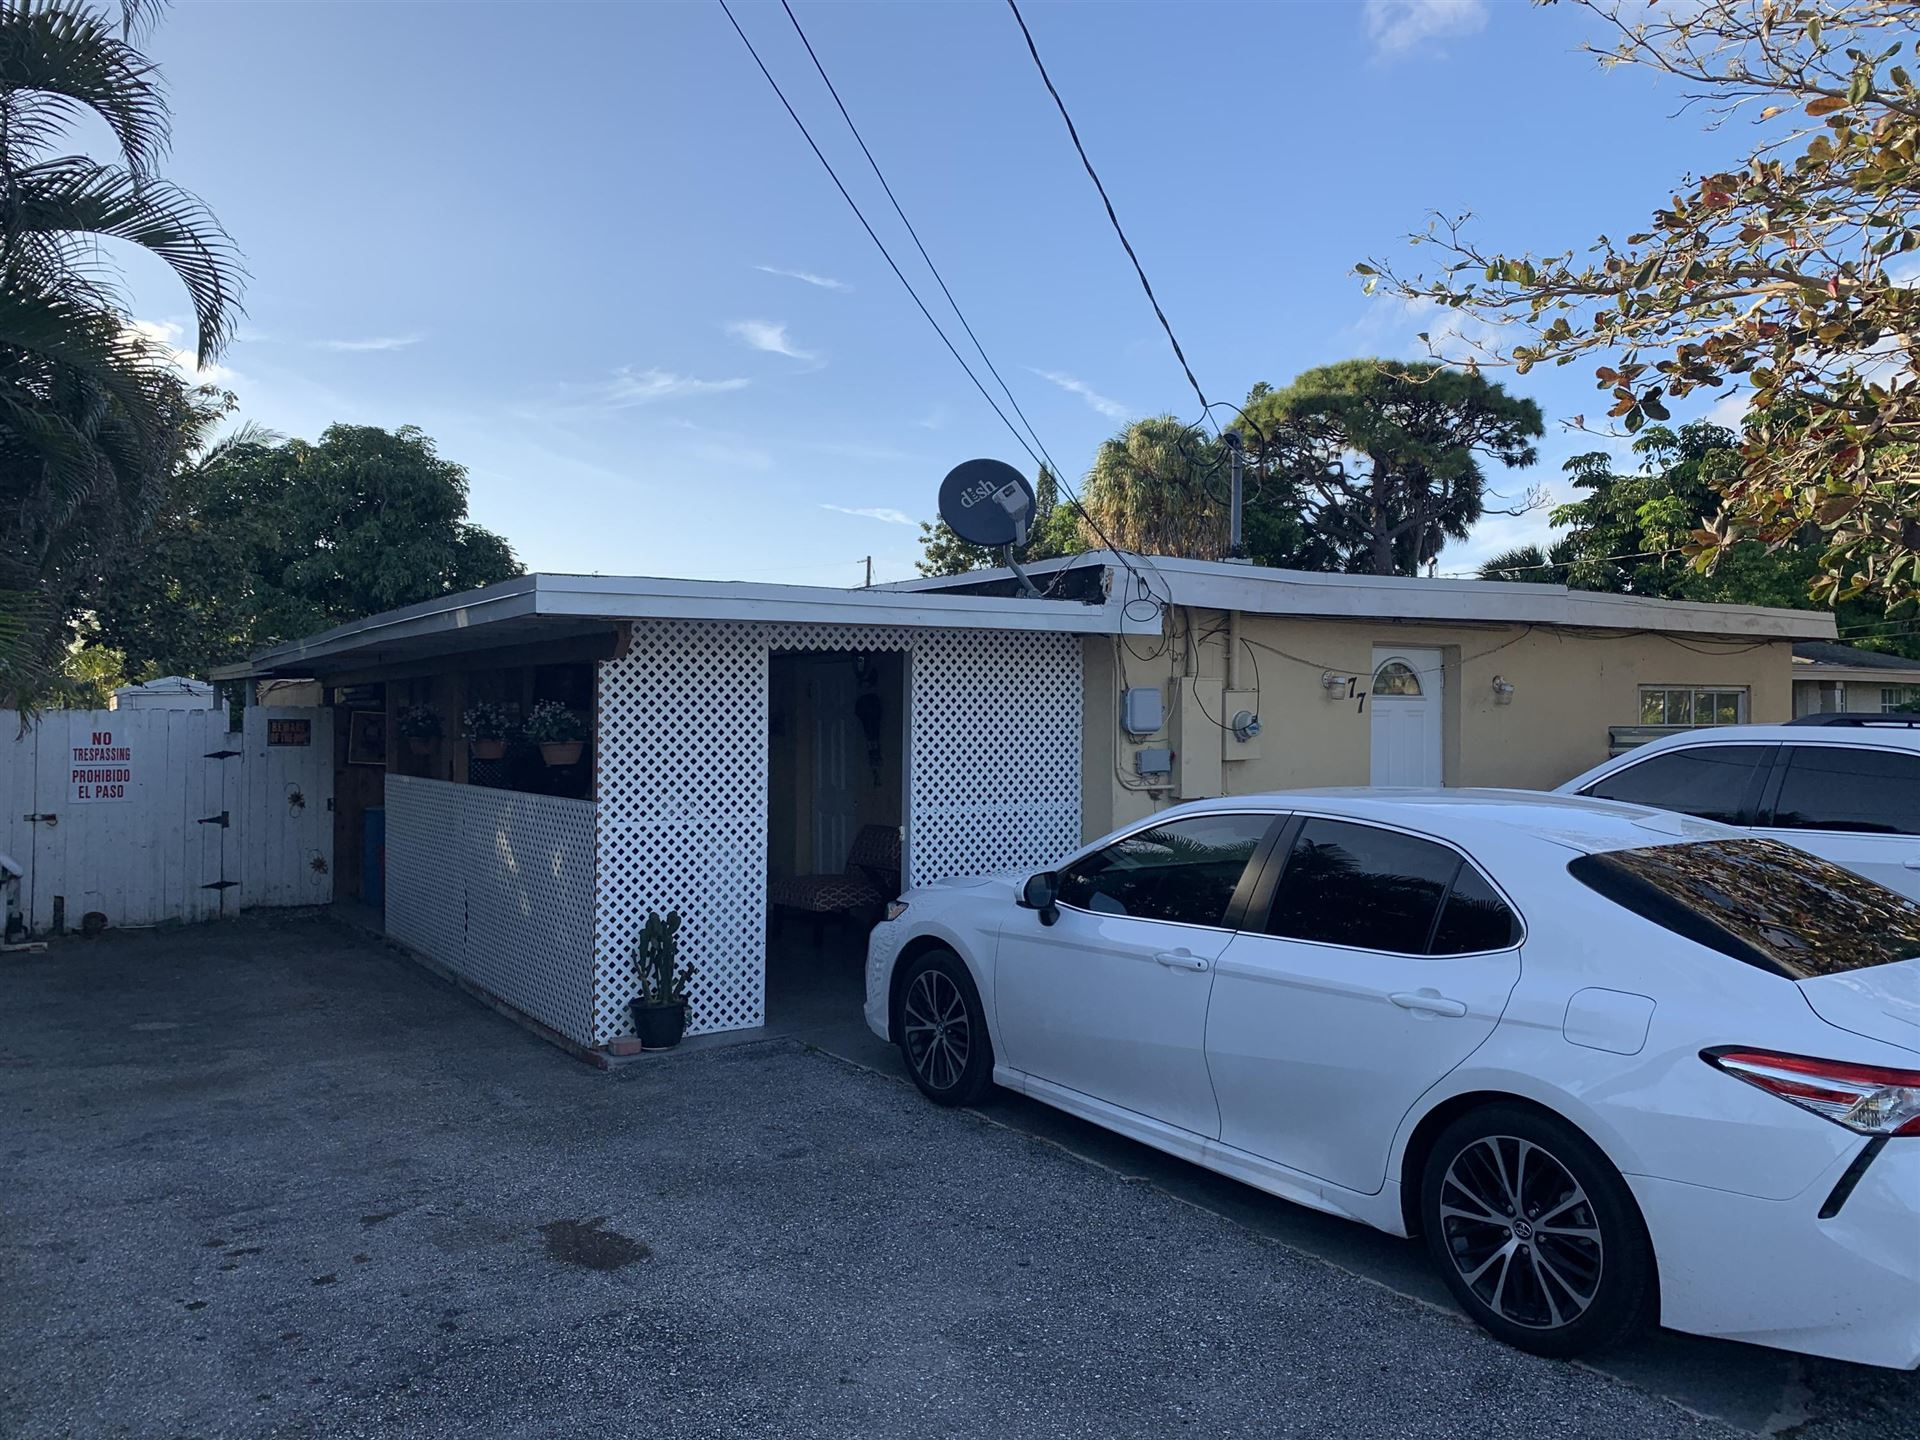 77 Caroline Drive, West Palm Beach, FL 33413 - #: RX-10601296